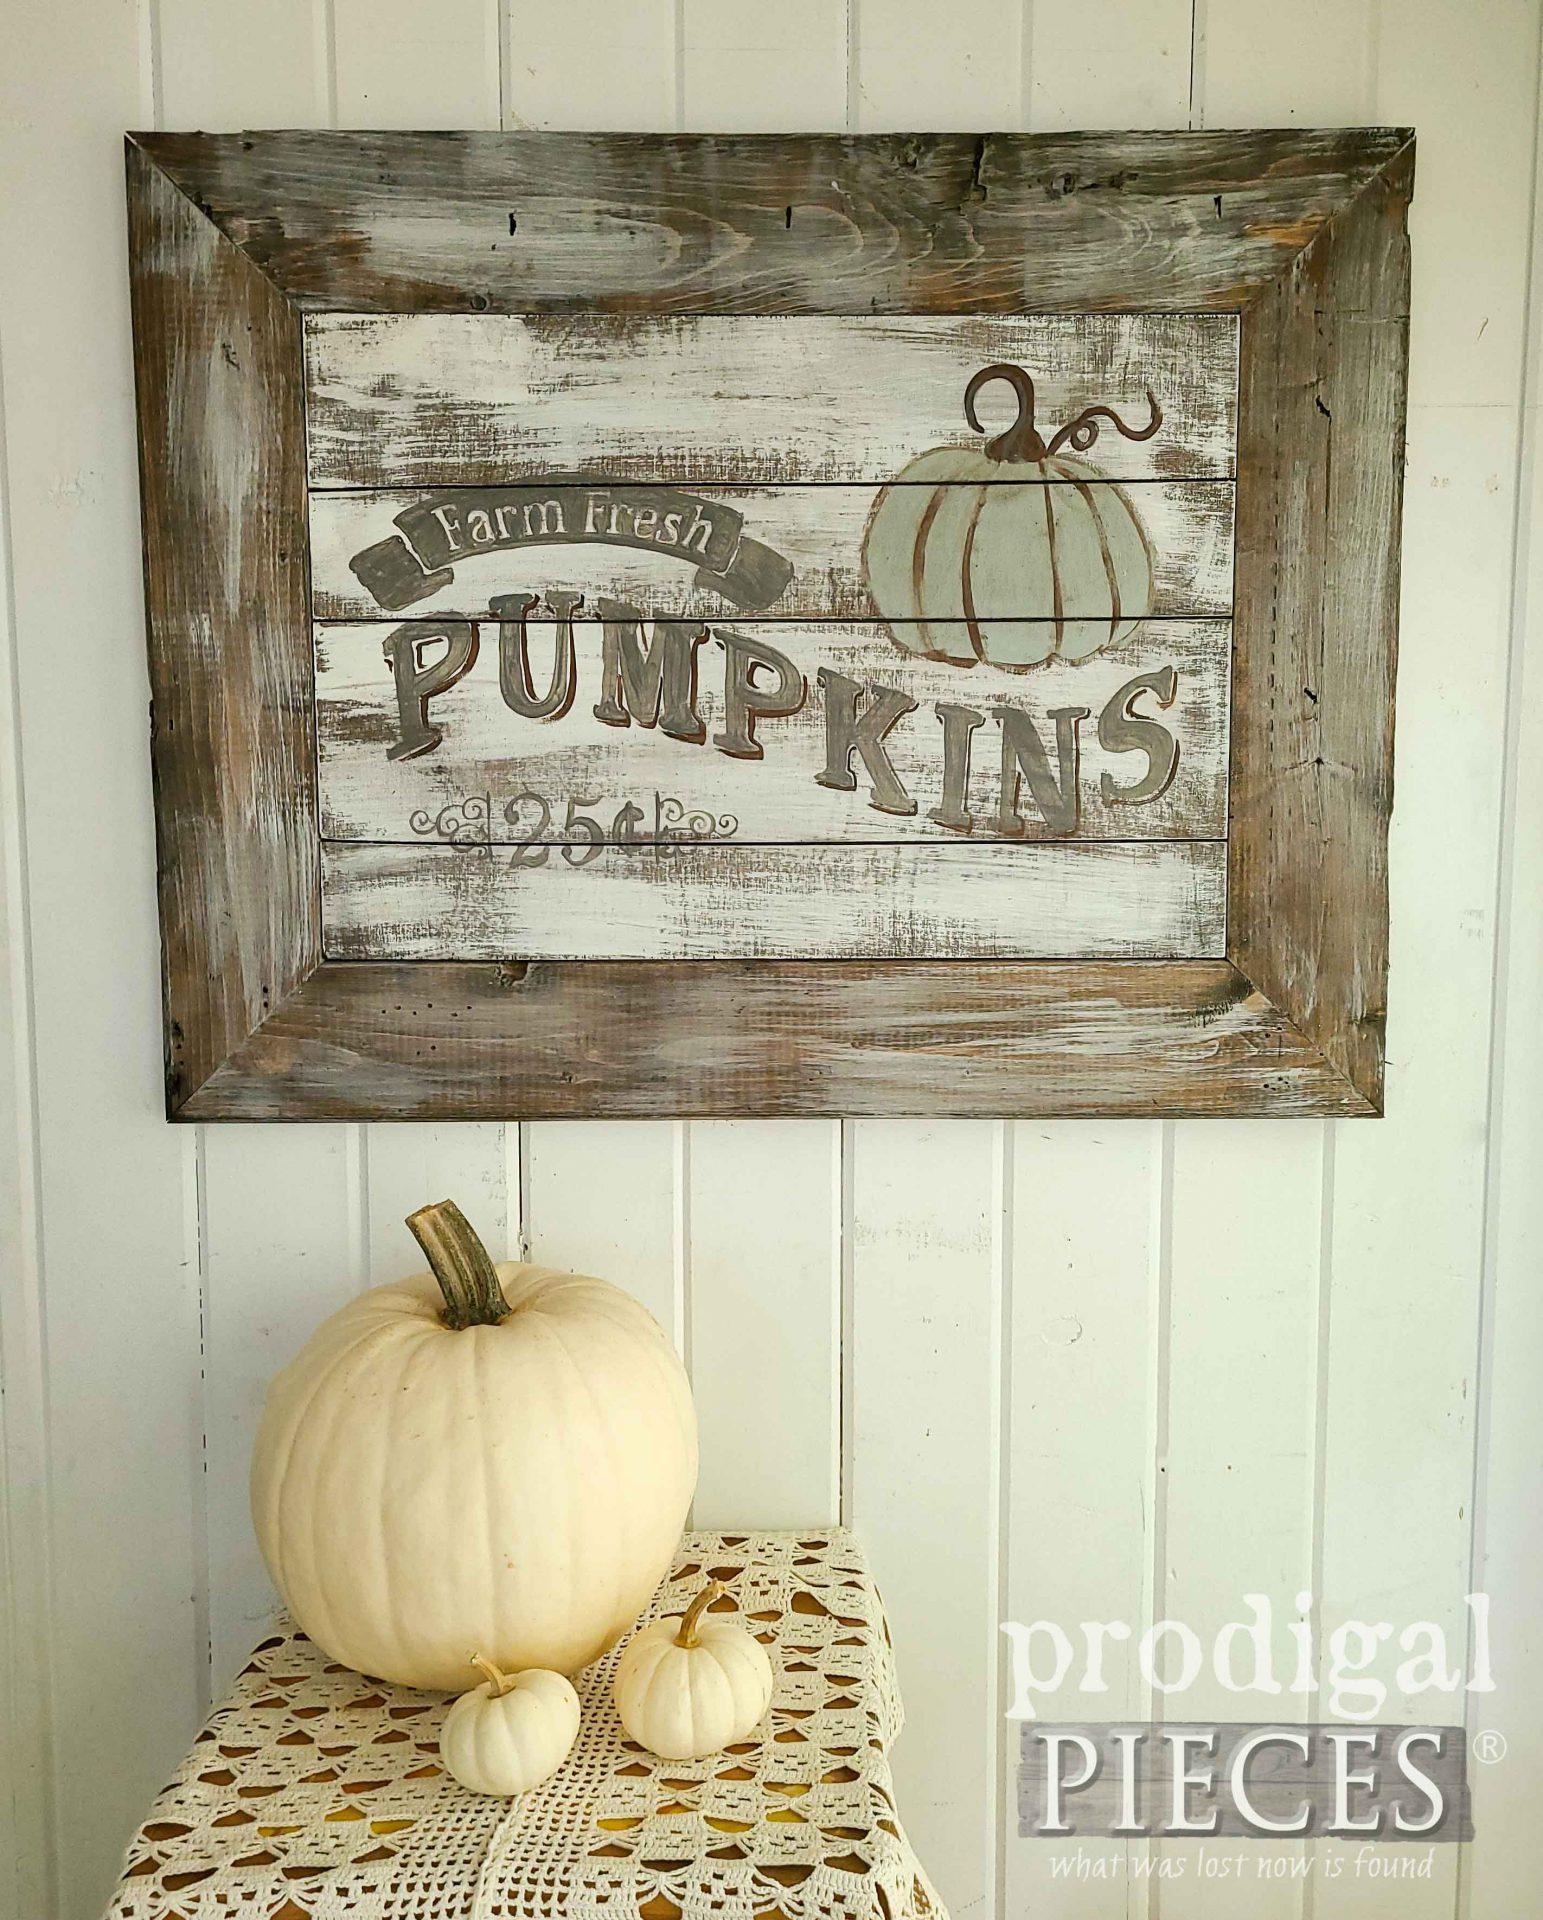 Rustic Chic Farmhouse Harvest Sign by Prodigal Pieces | prodigalpieces.com #prodigalpieces #diy #harvest #farmhouse #diy #home #homedecor